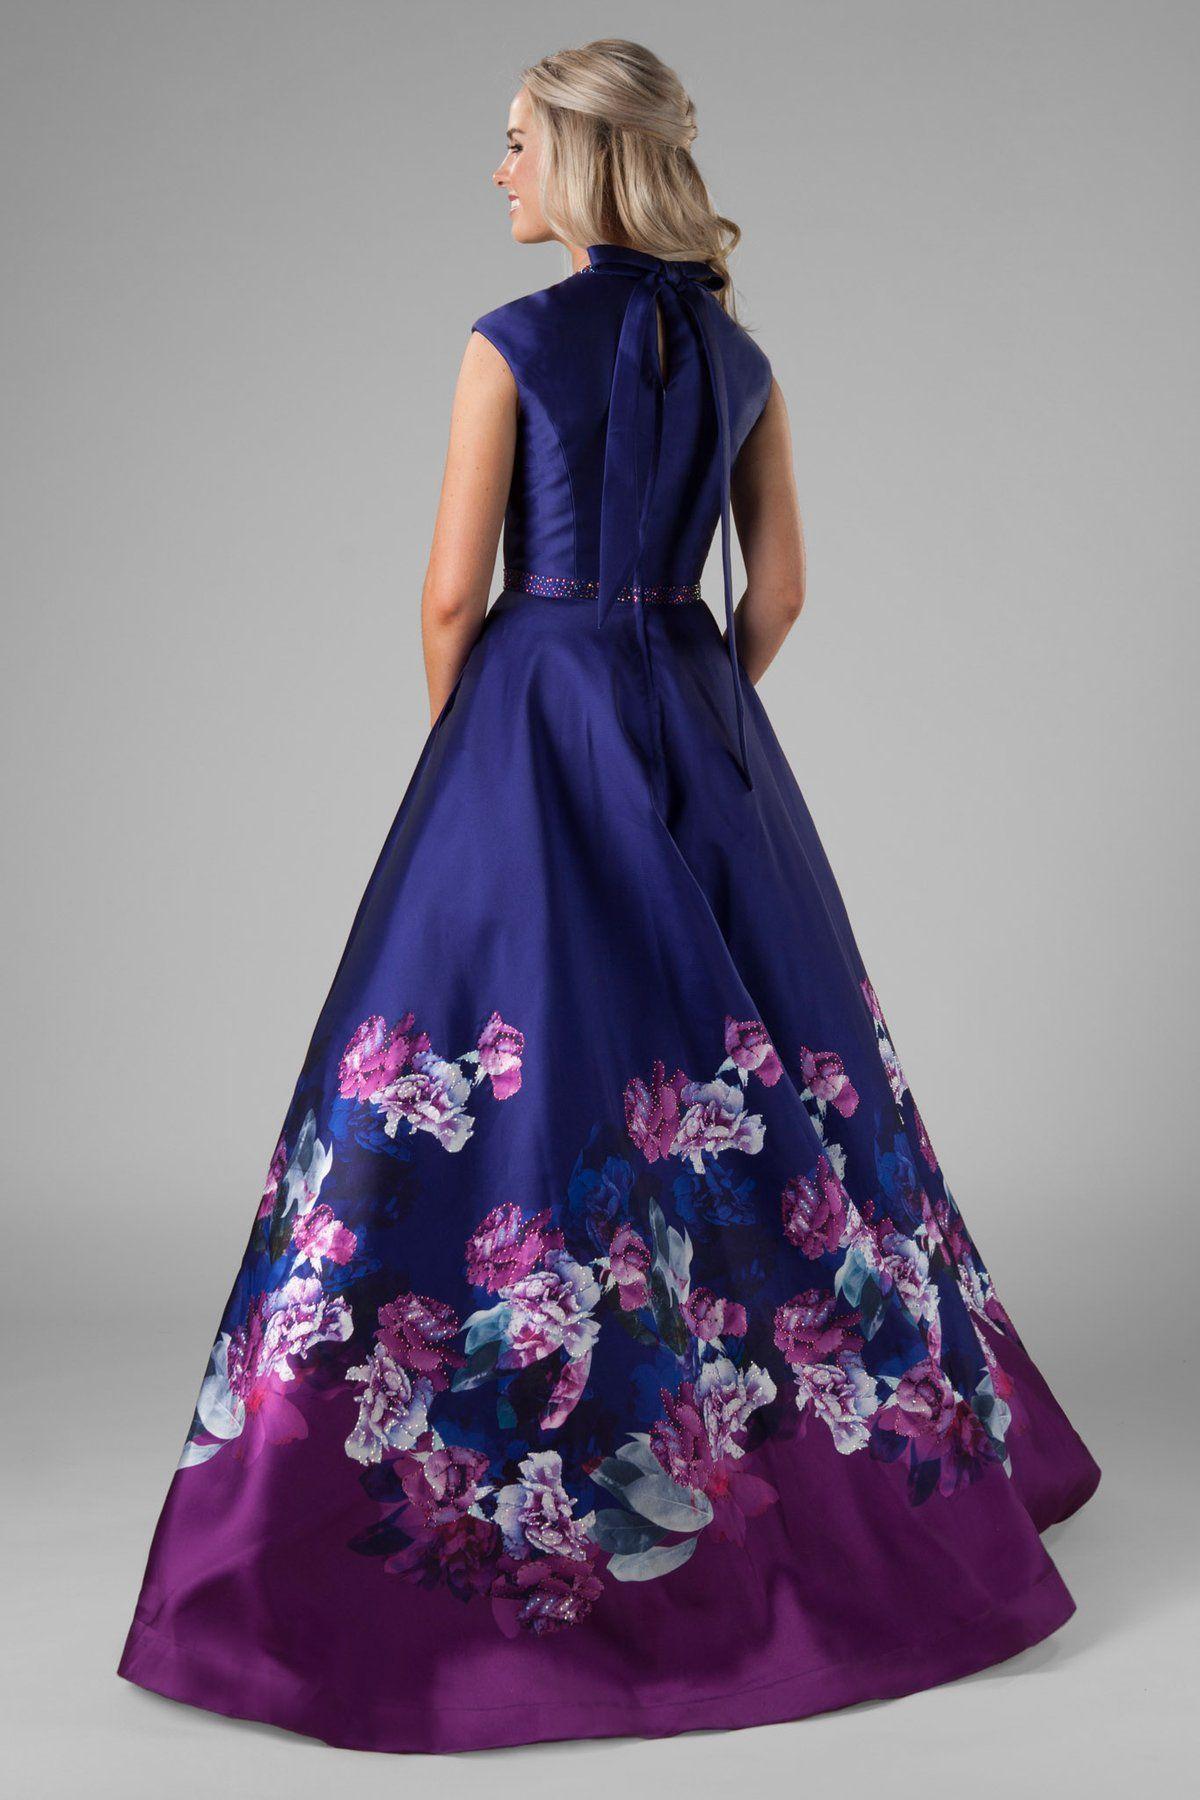 d317232d34887 Saylor in 2019 | cocktail dress | Dresses, Modest dresses, Prom dresses